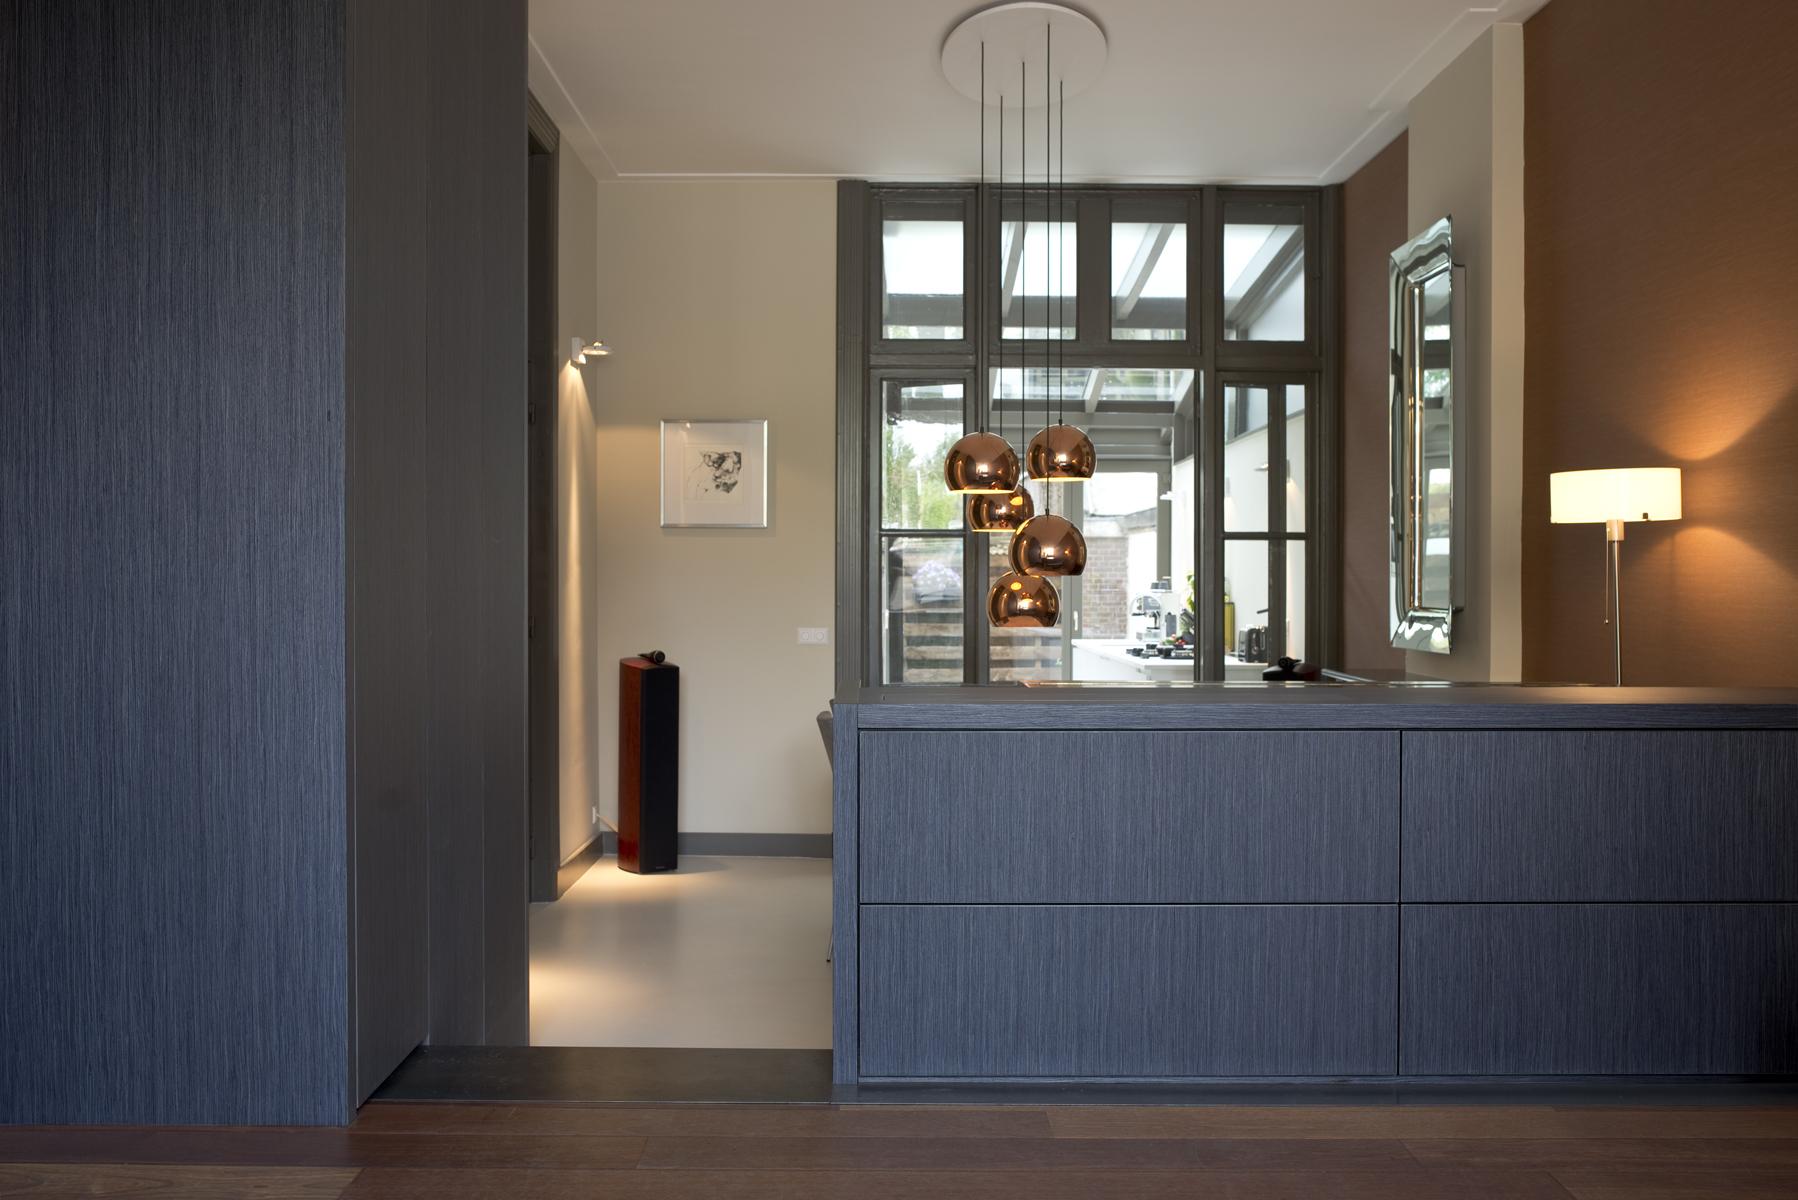 rietveld interieurbouw amsterdam keuken 19